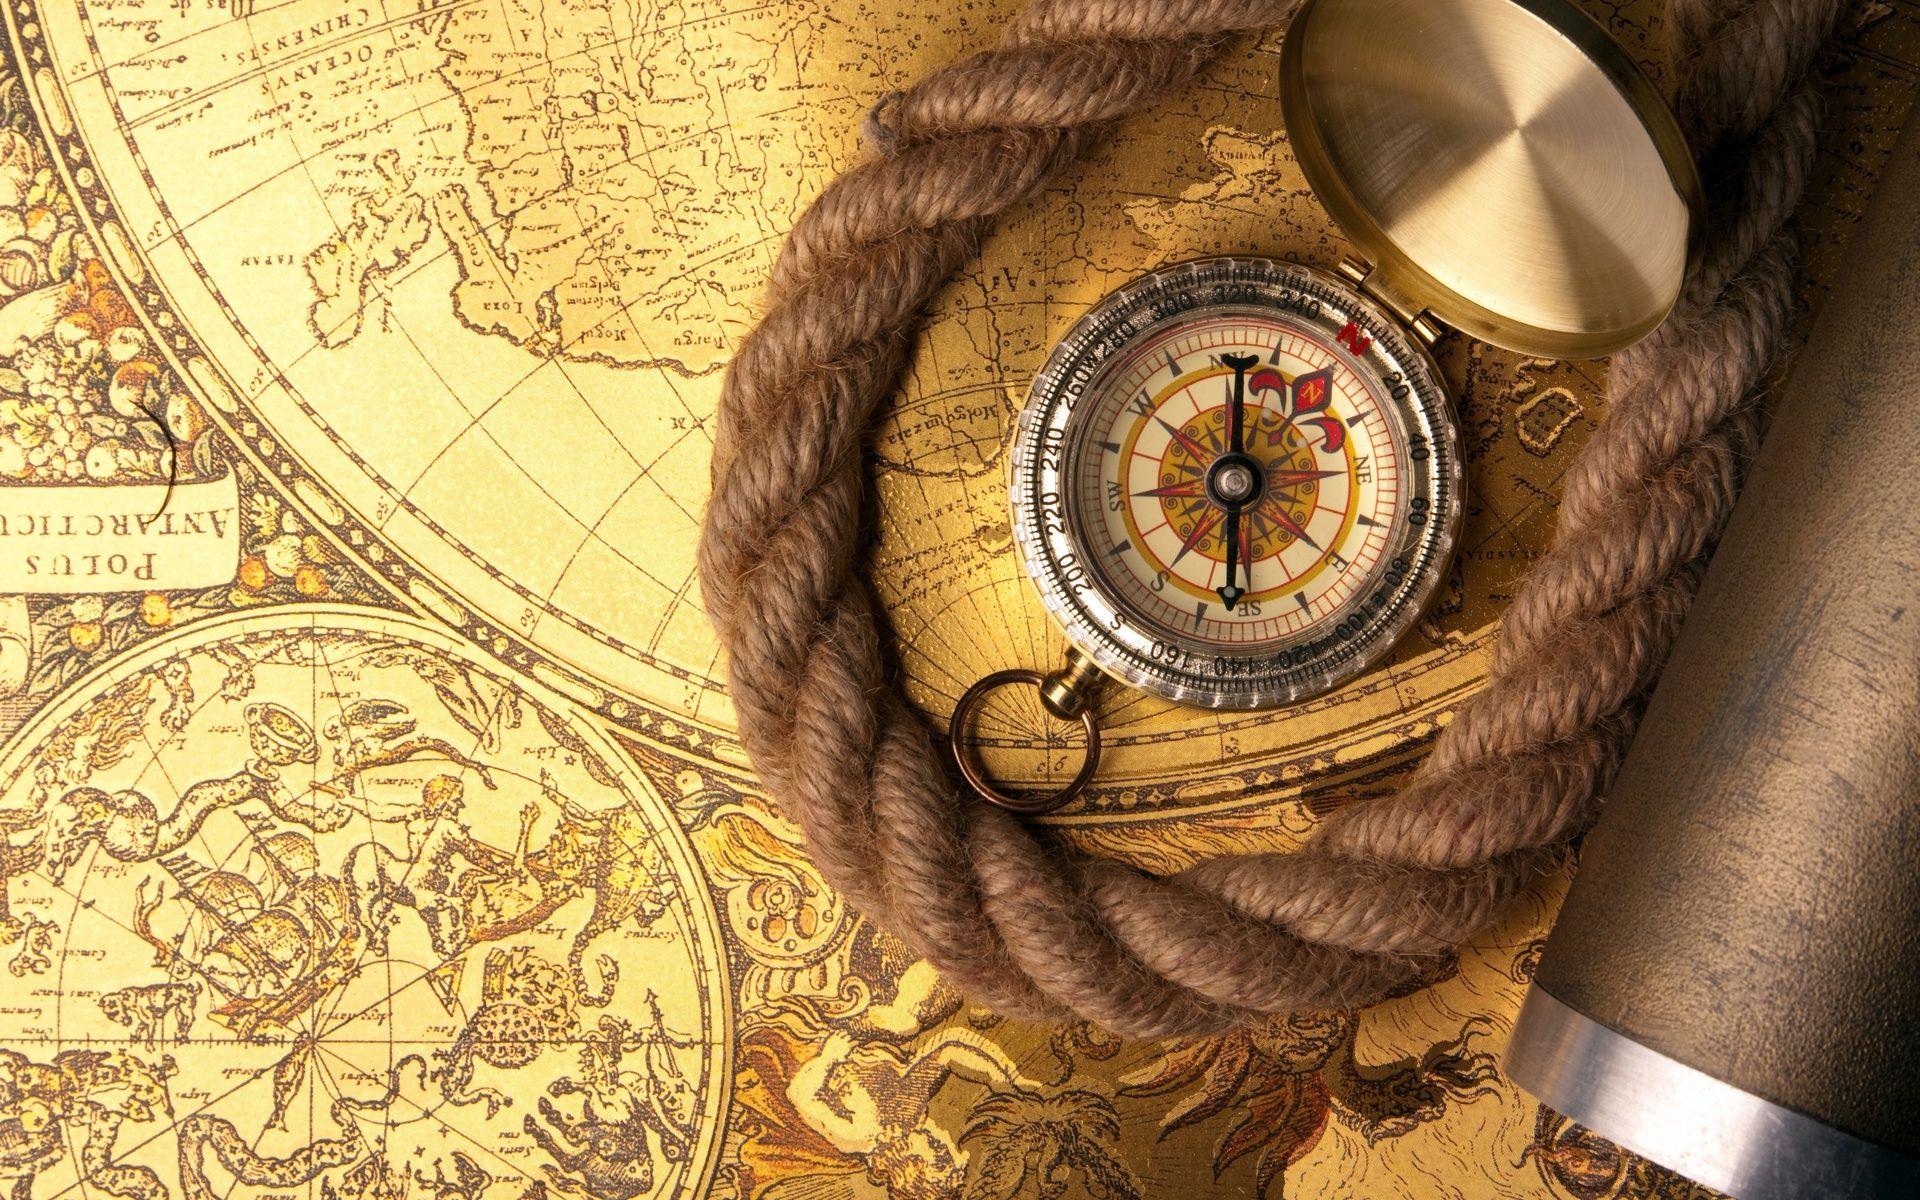 pengiriman-gratis-yang-modern-bumi-tengah-peta-dinding-antik